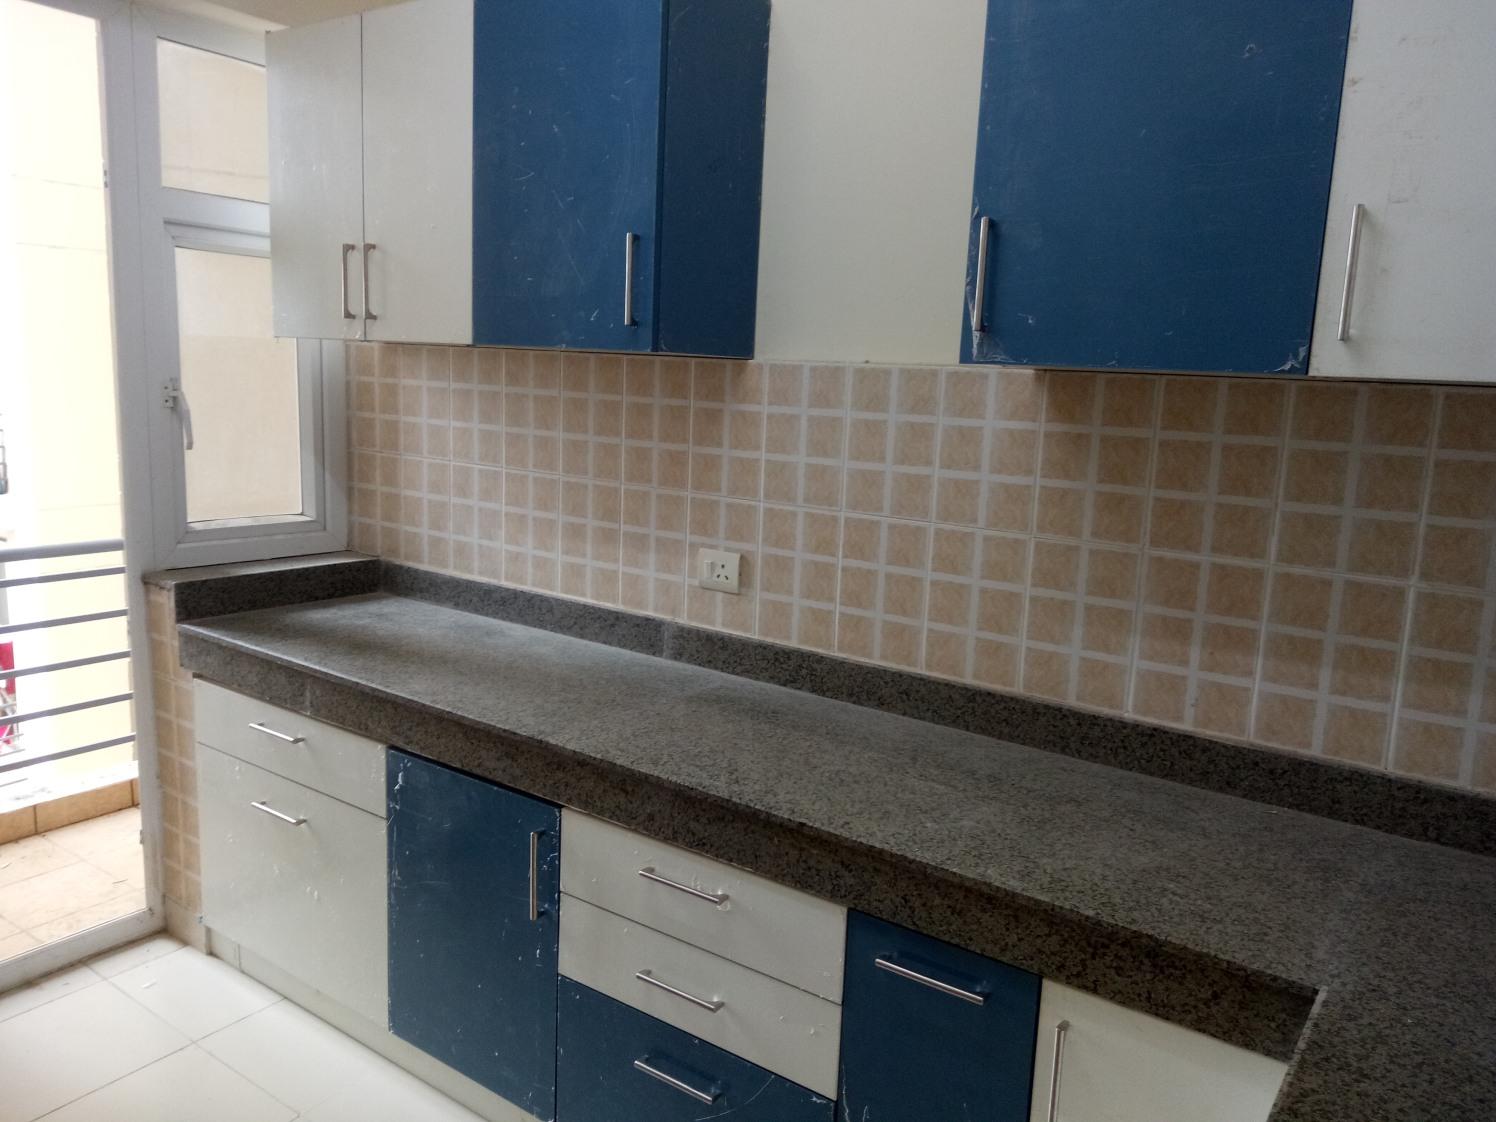 L Shaped Kitchen by Amit Sharma  Modular-kitchen Contemporary | Interior Design Photos & Ideas